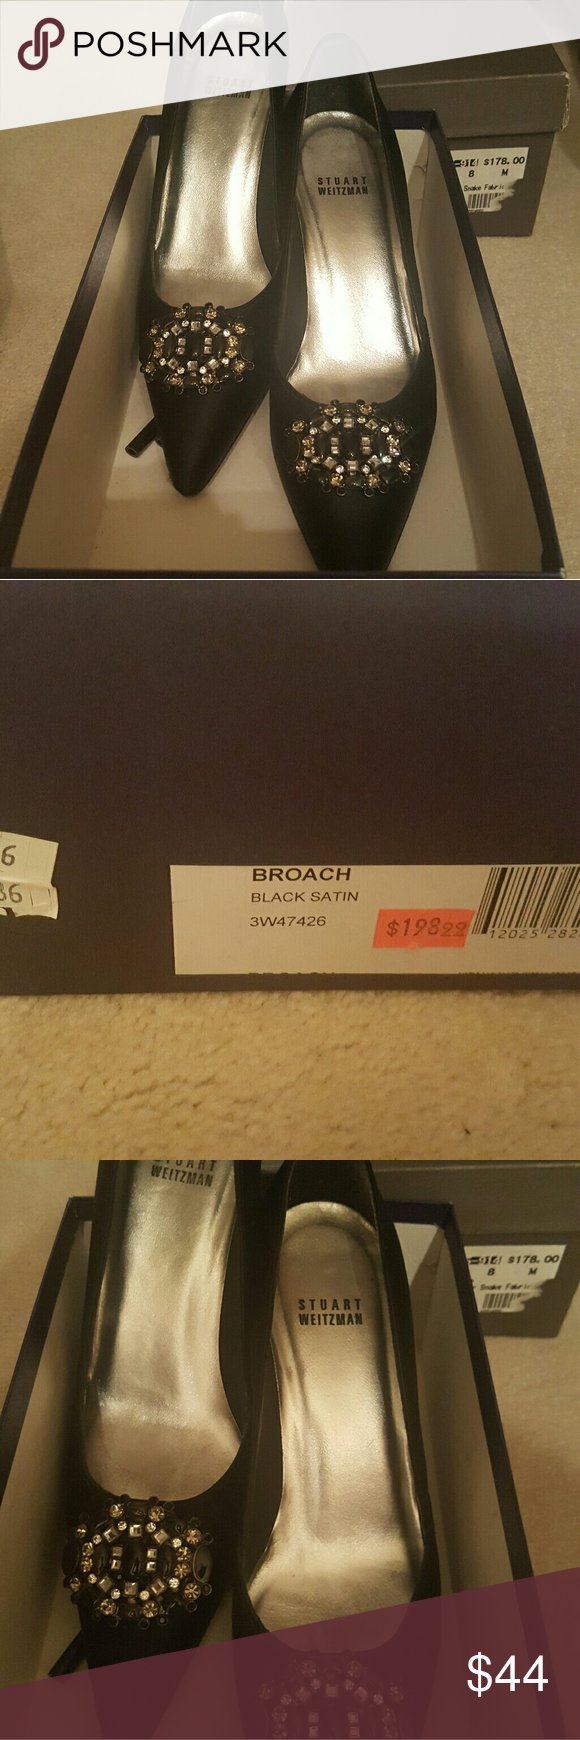 Stuart Weitzman broach black satin pump Perfect condition Stuart Weitzman Shoes Heels